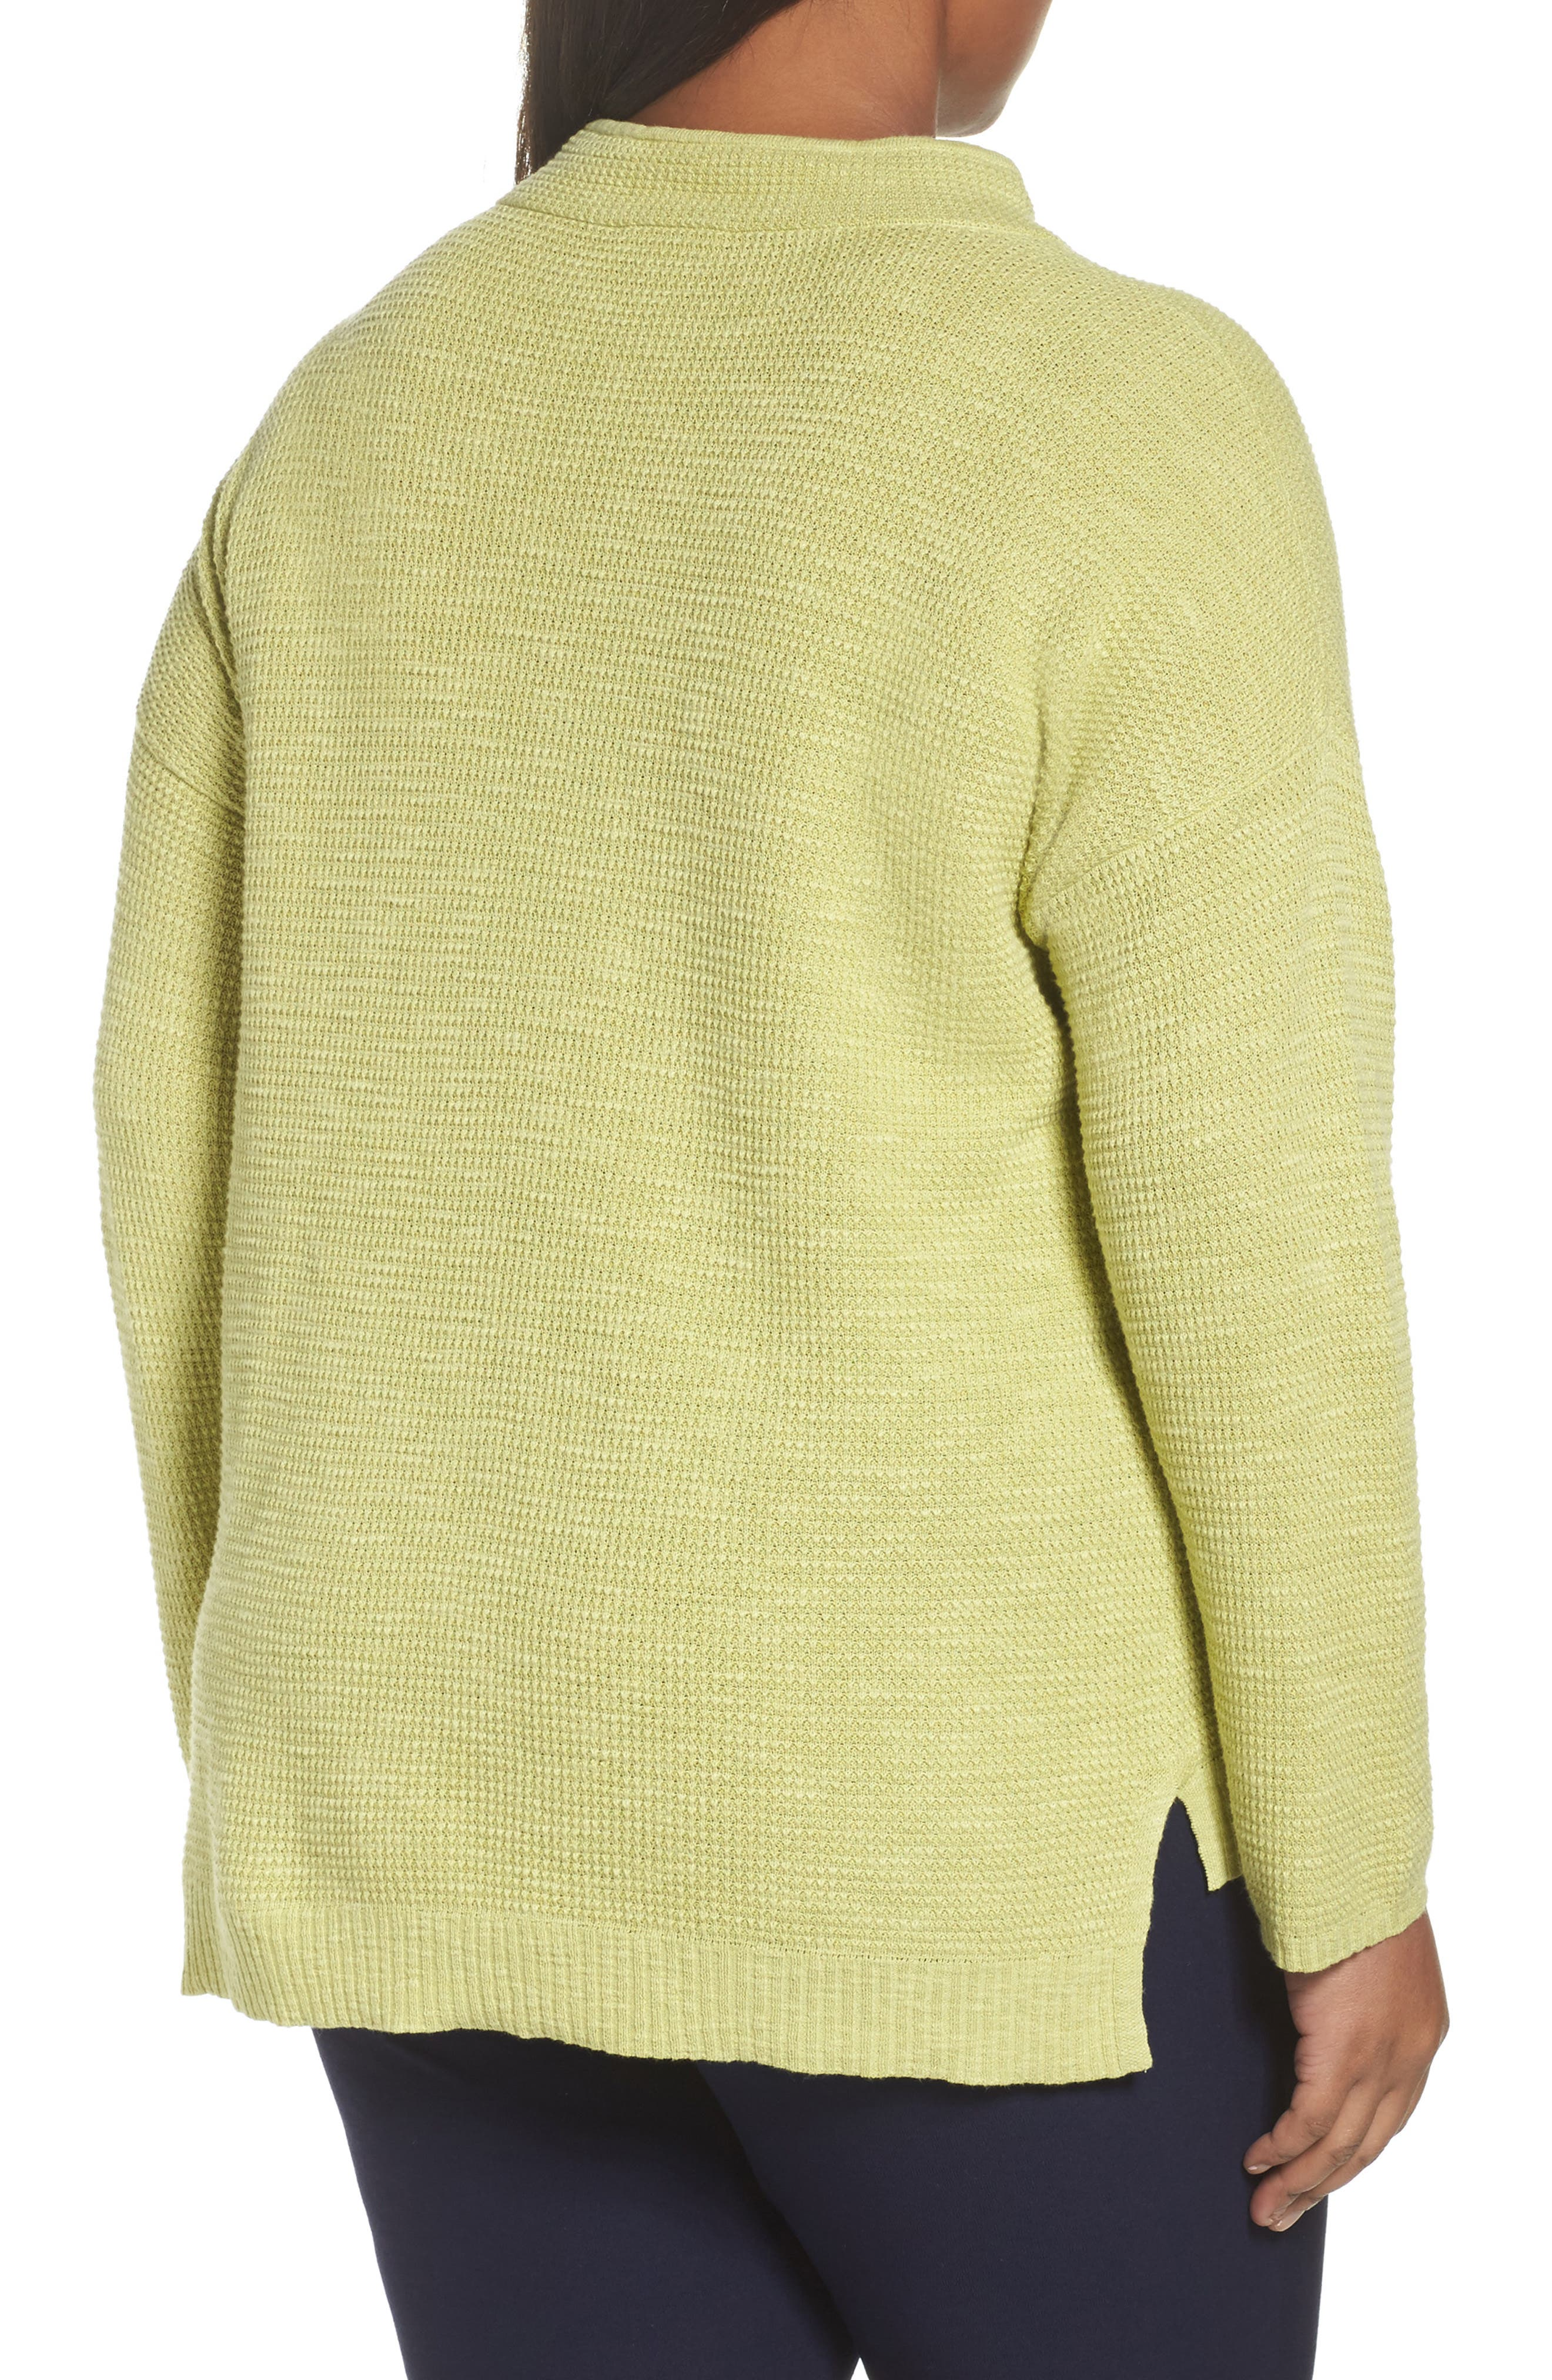 Alternate Image 2  - Eileen Fisher Drawstring Neck Organic Linen & Cotton Top (Plus Size)